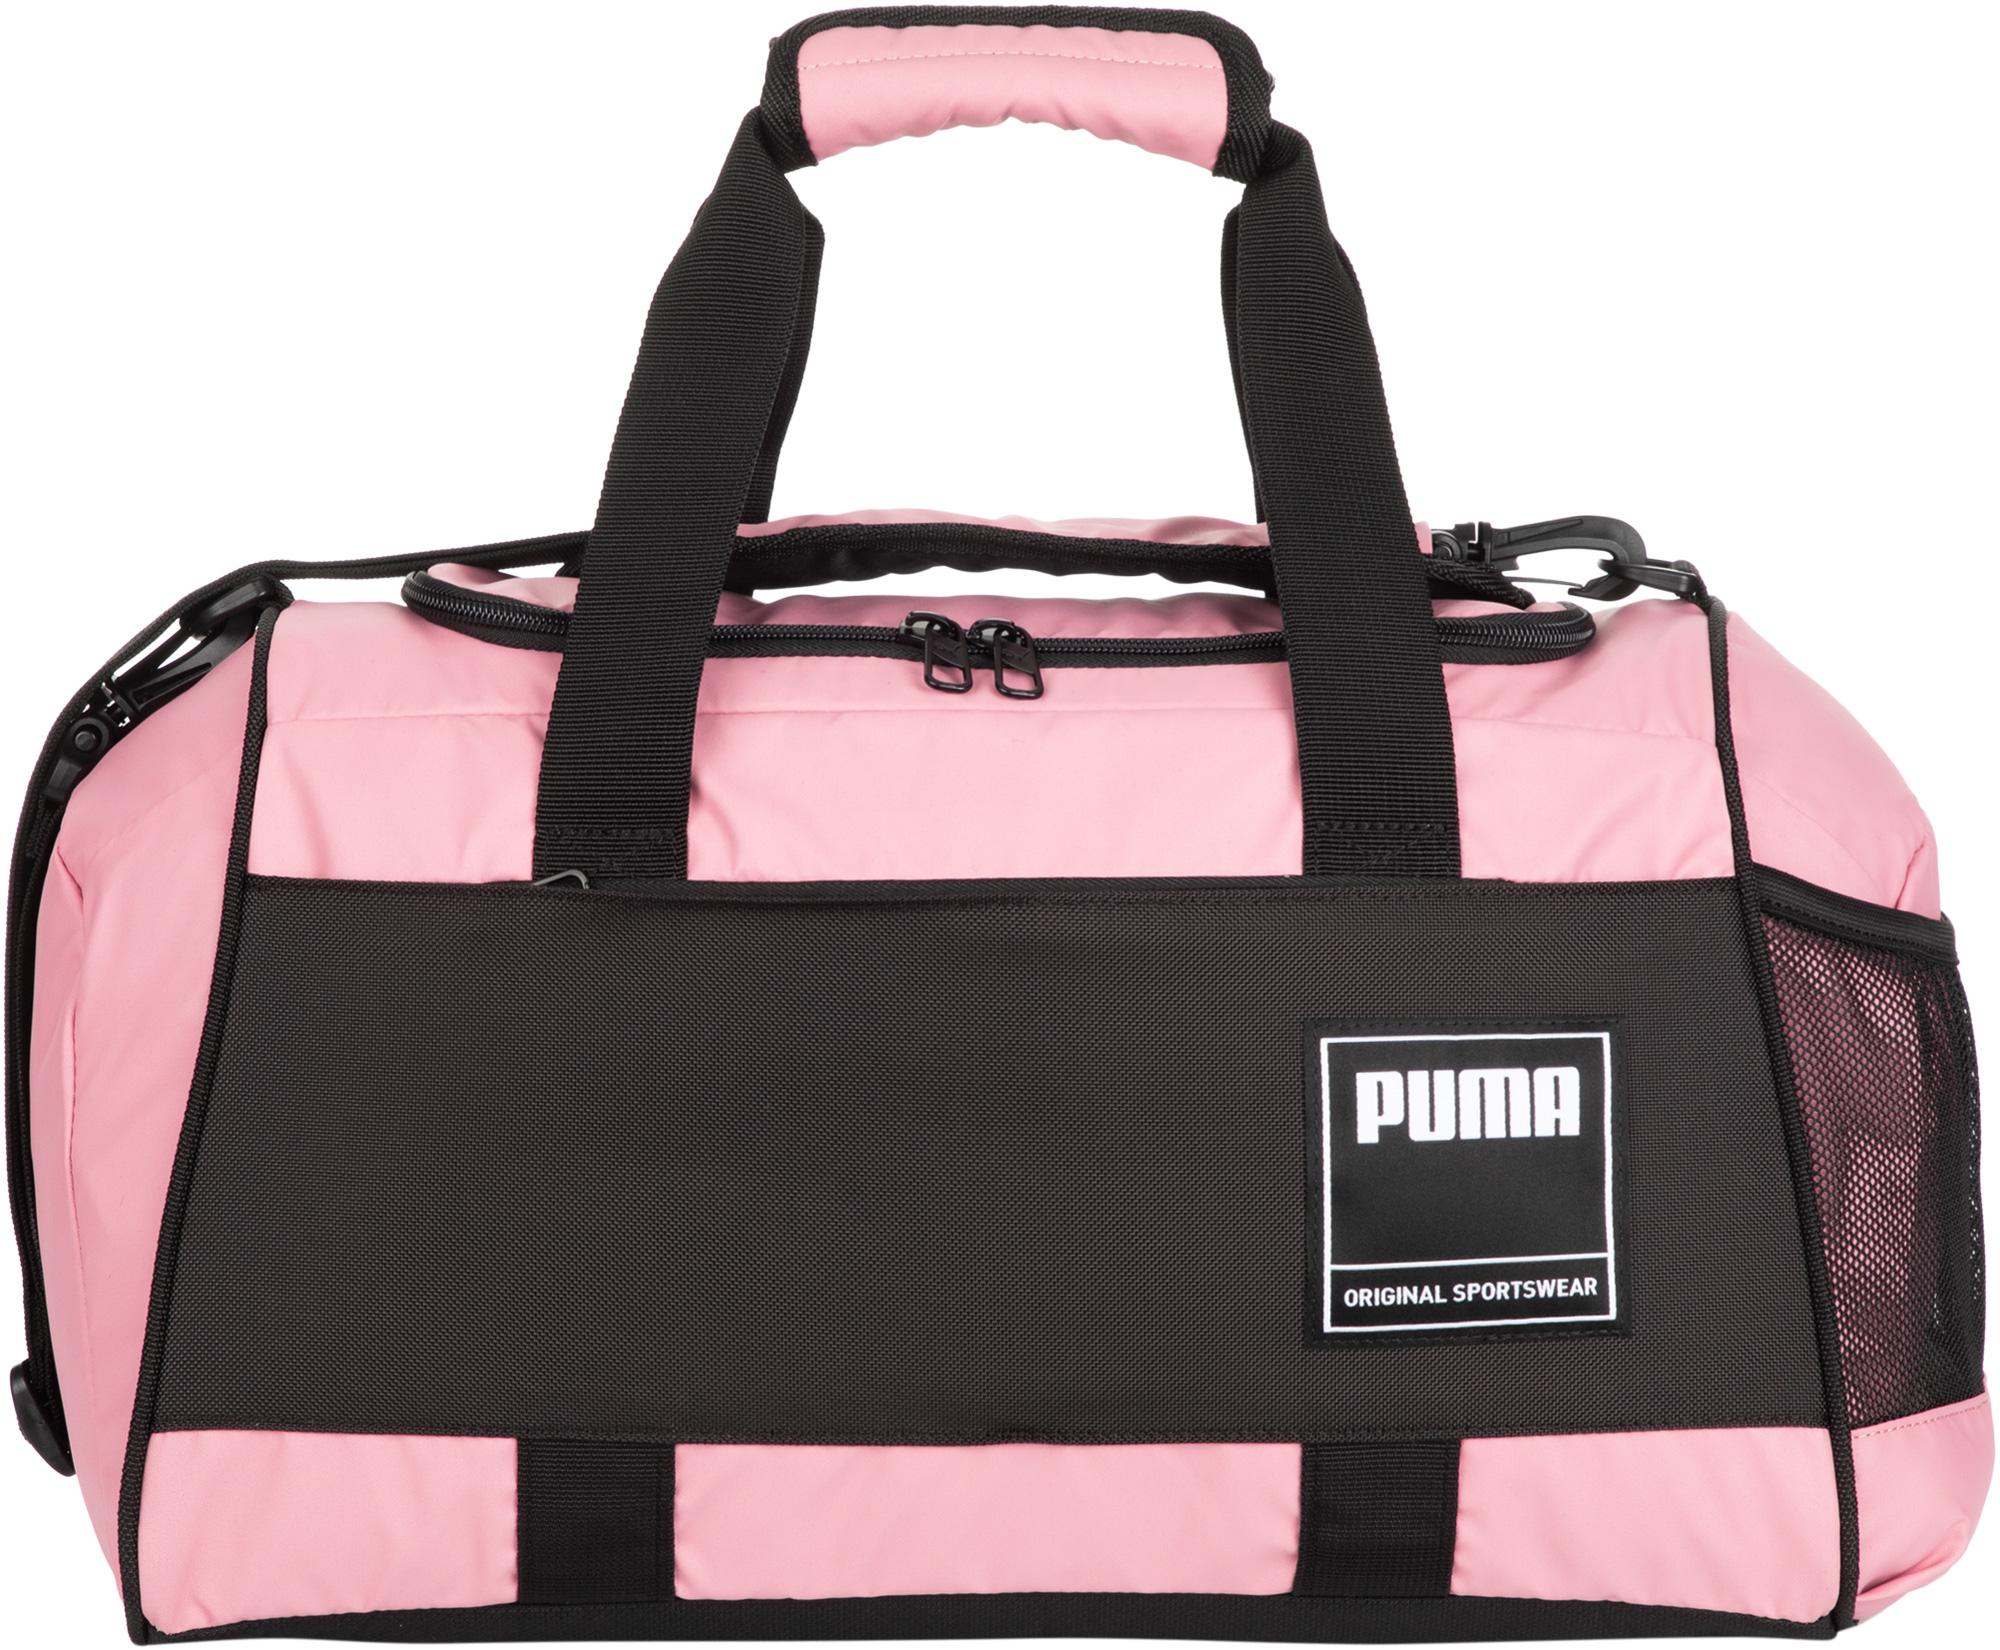 Puma Сумка женская Puma puma сумка puma challenger размер null